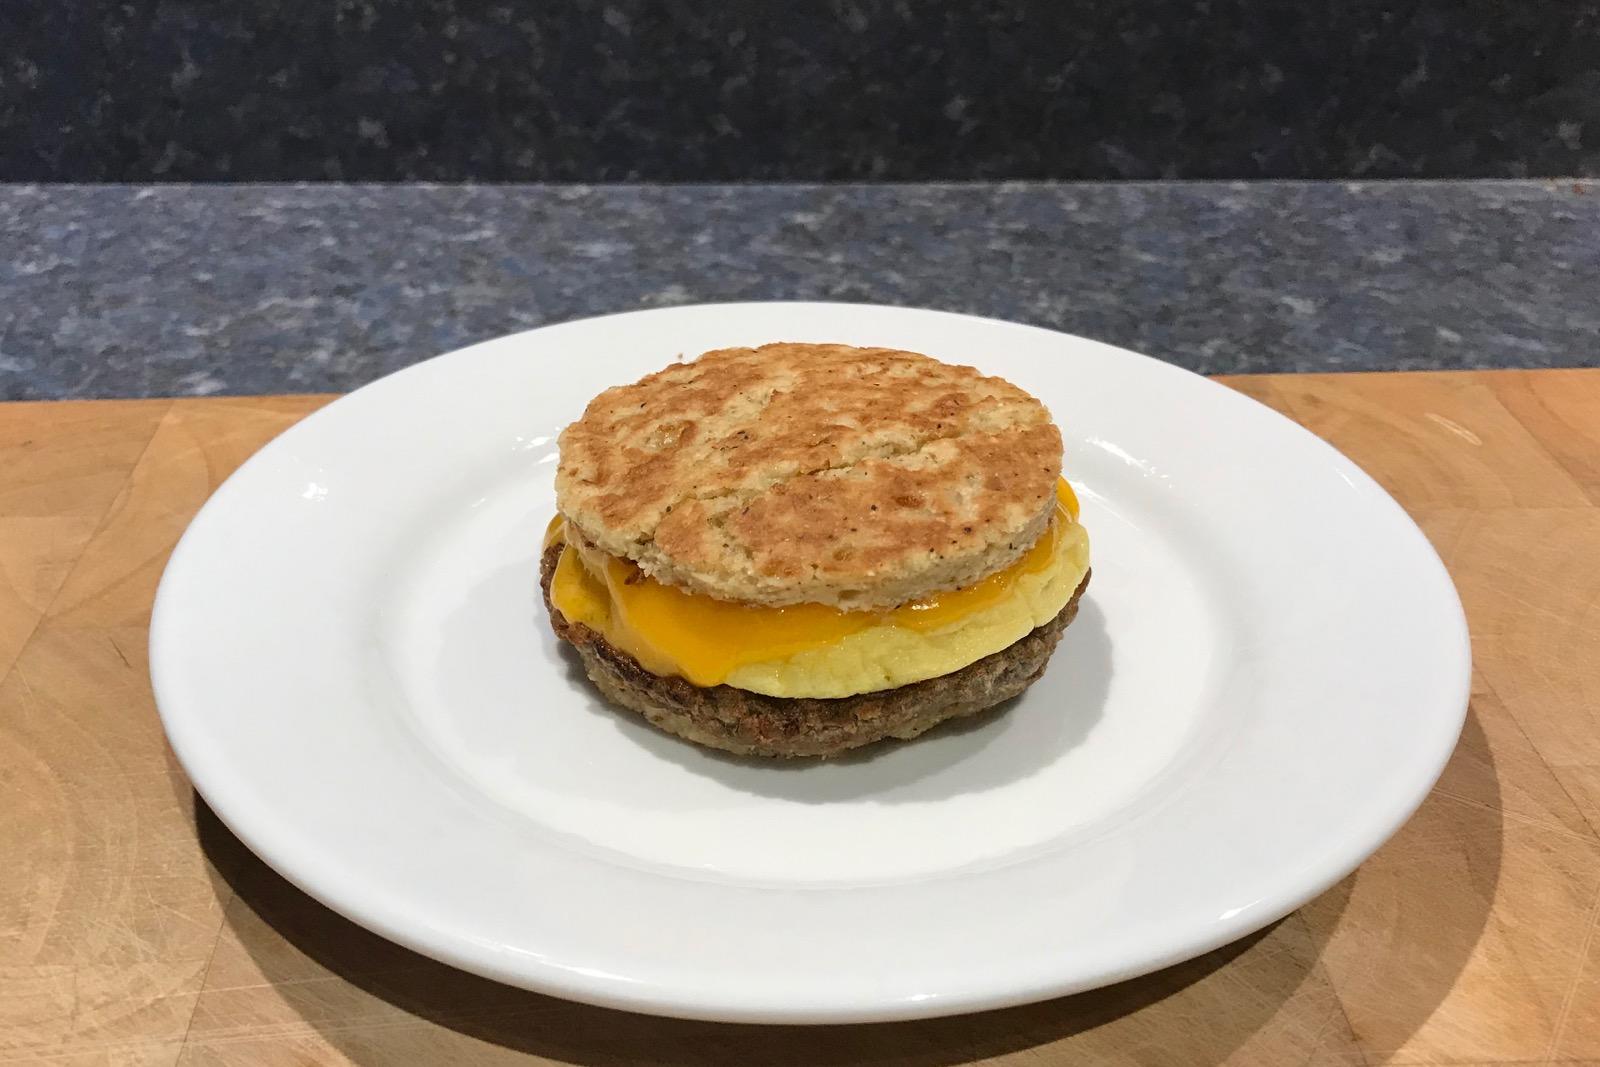 http://blog.rickk.com/food/2019/06/01/ate.2019.06.01.b.jpg